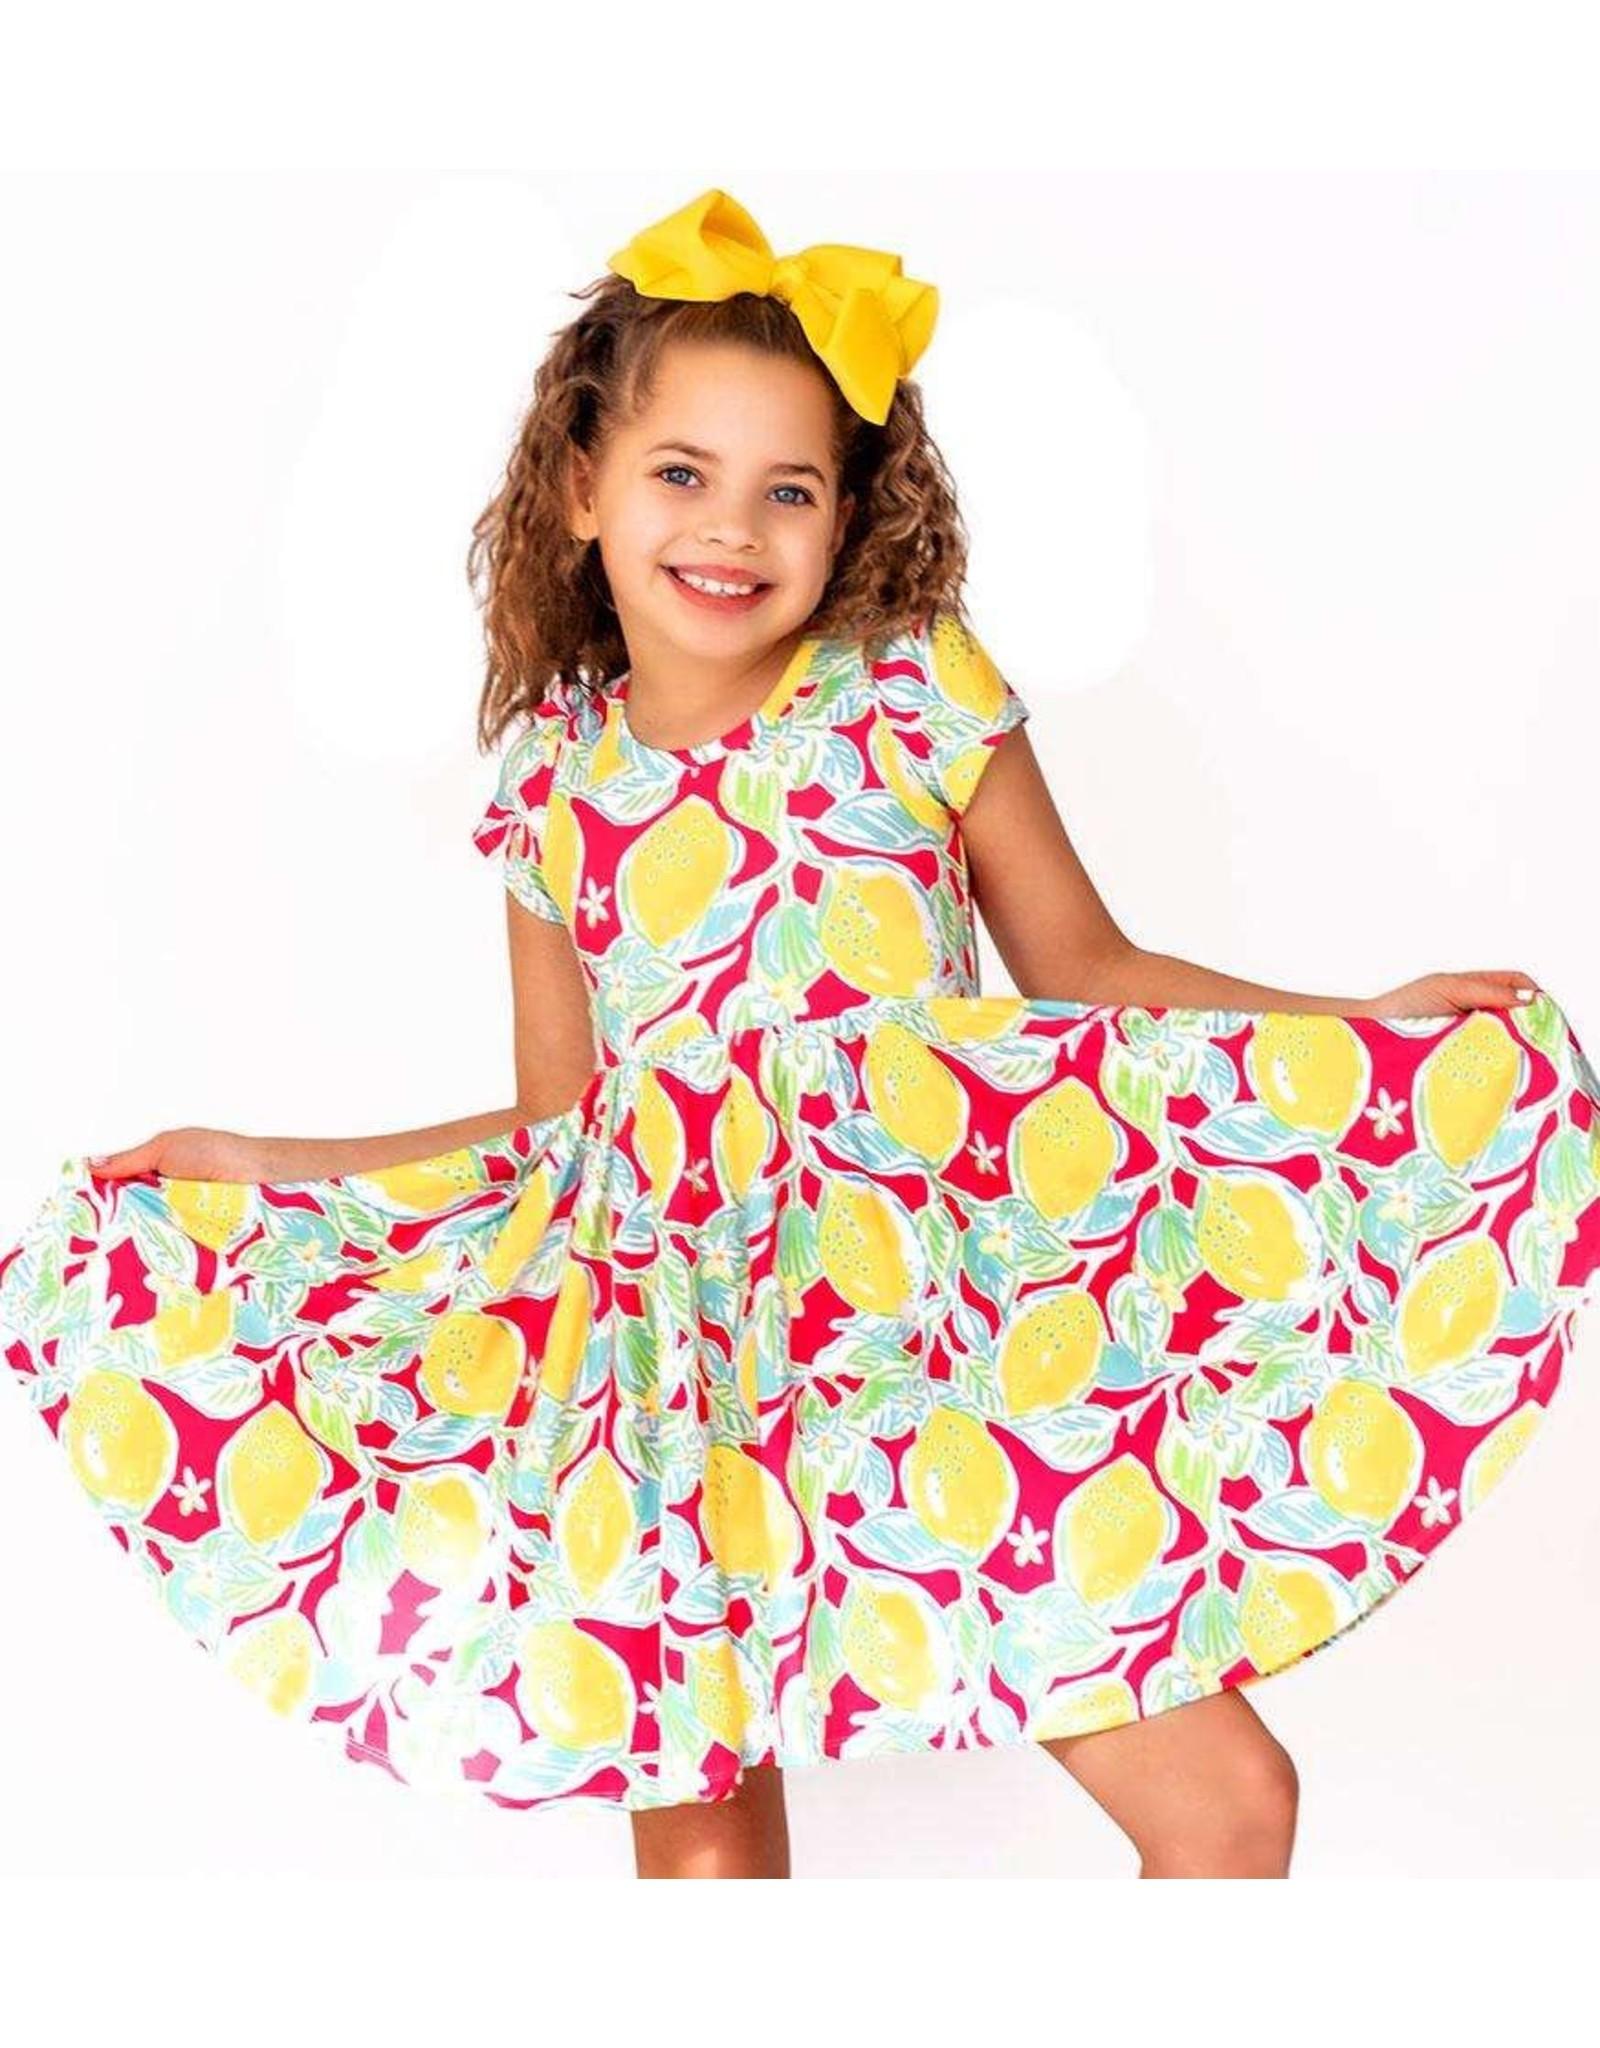 Charlies Project Charlie's Project - Pink Lemonade Soft Twirl Dress